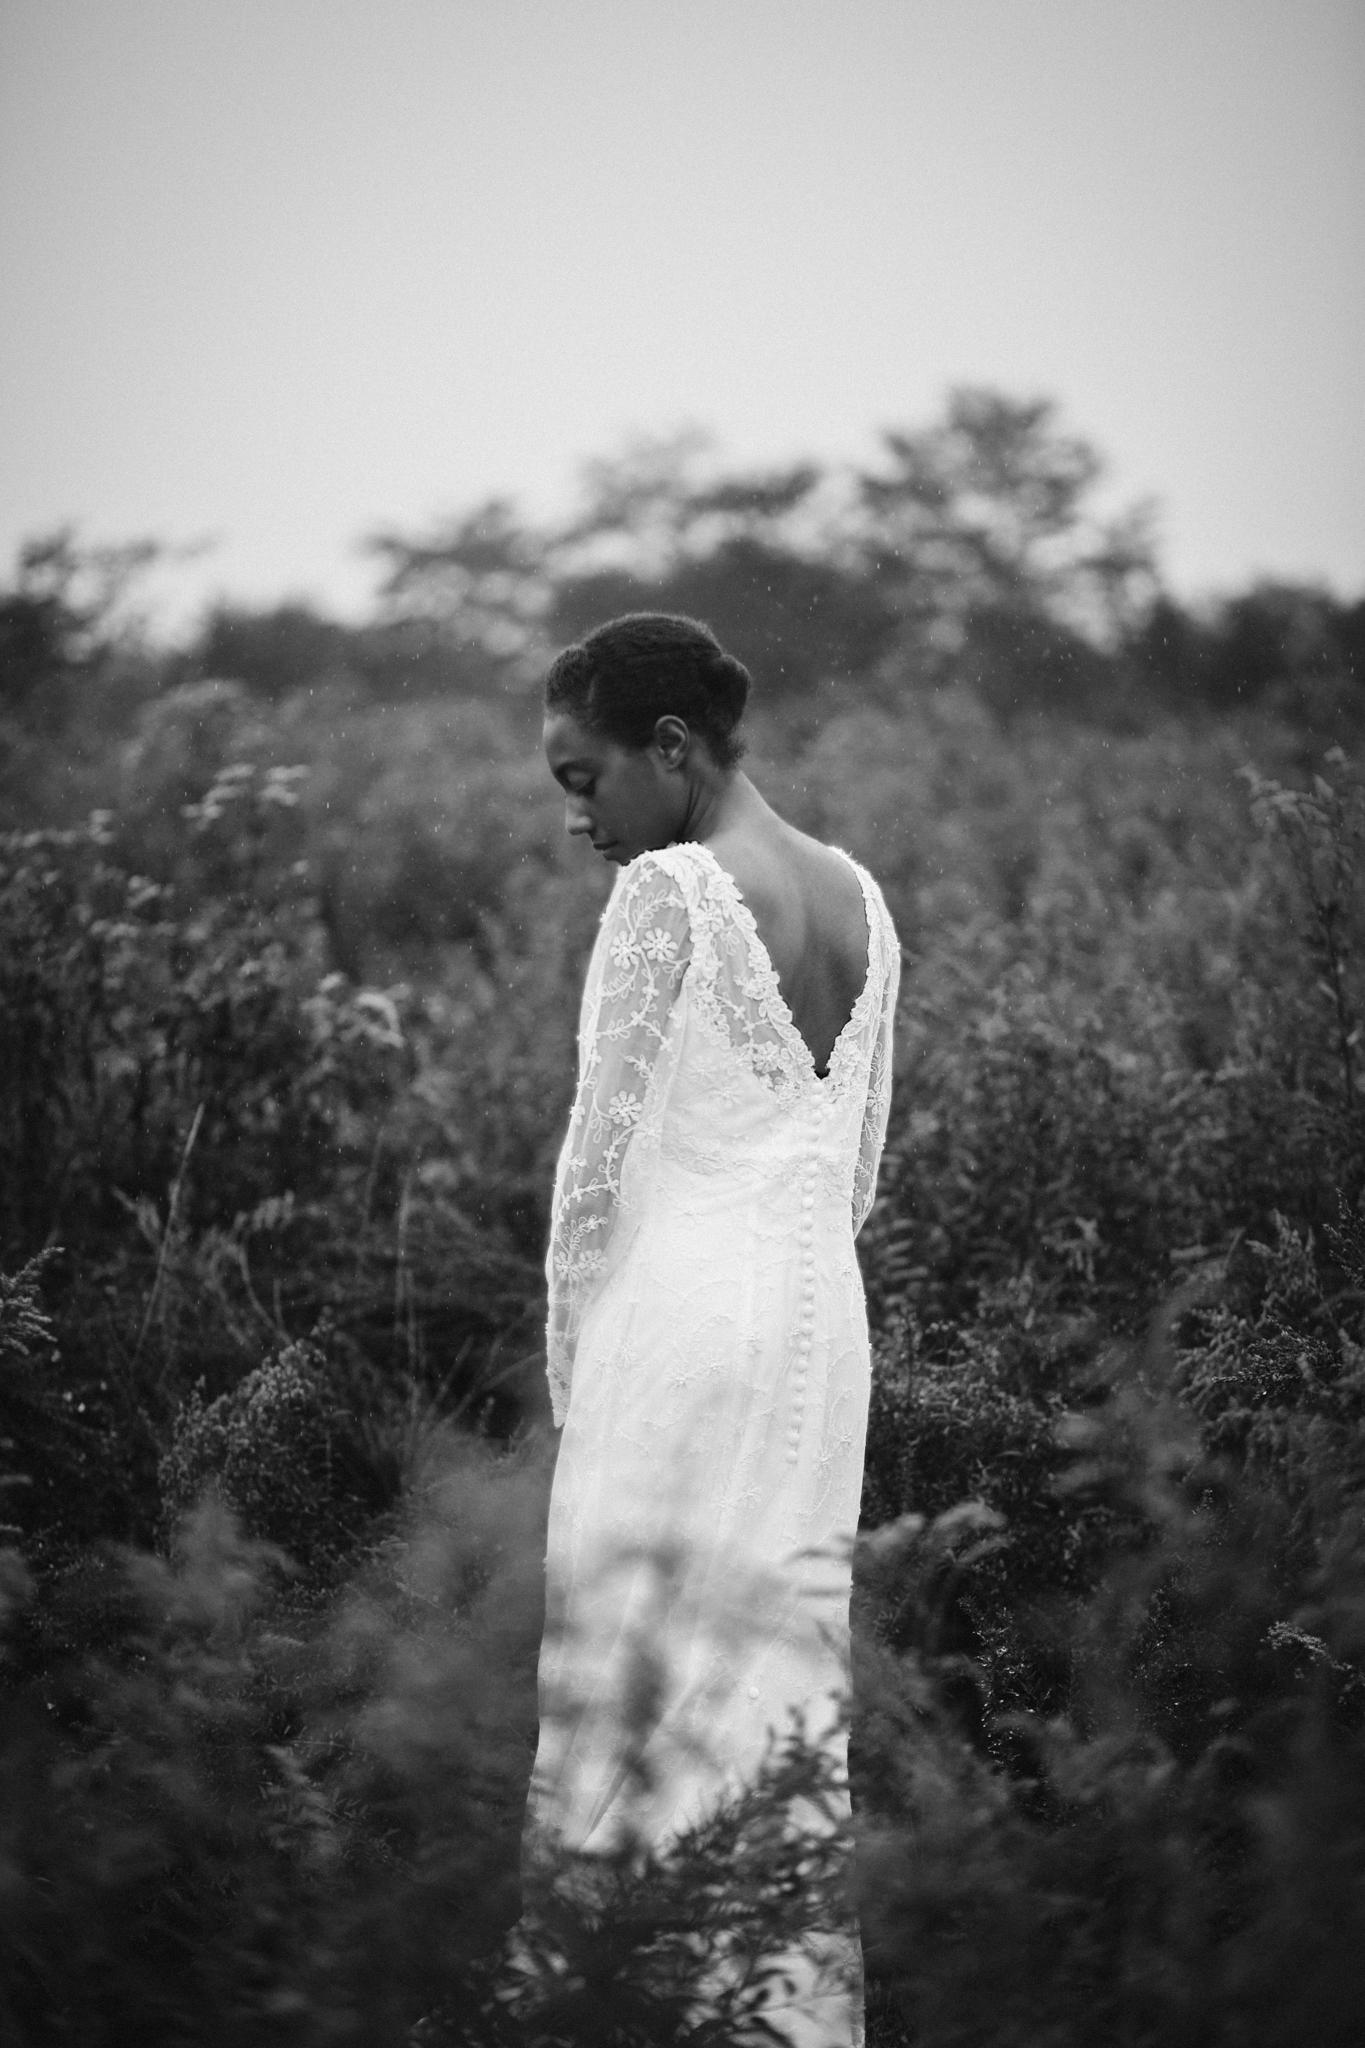 rebeccaburtphotographygo.FrederickMarylandWedding.Vintage-13.JPG